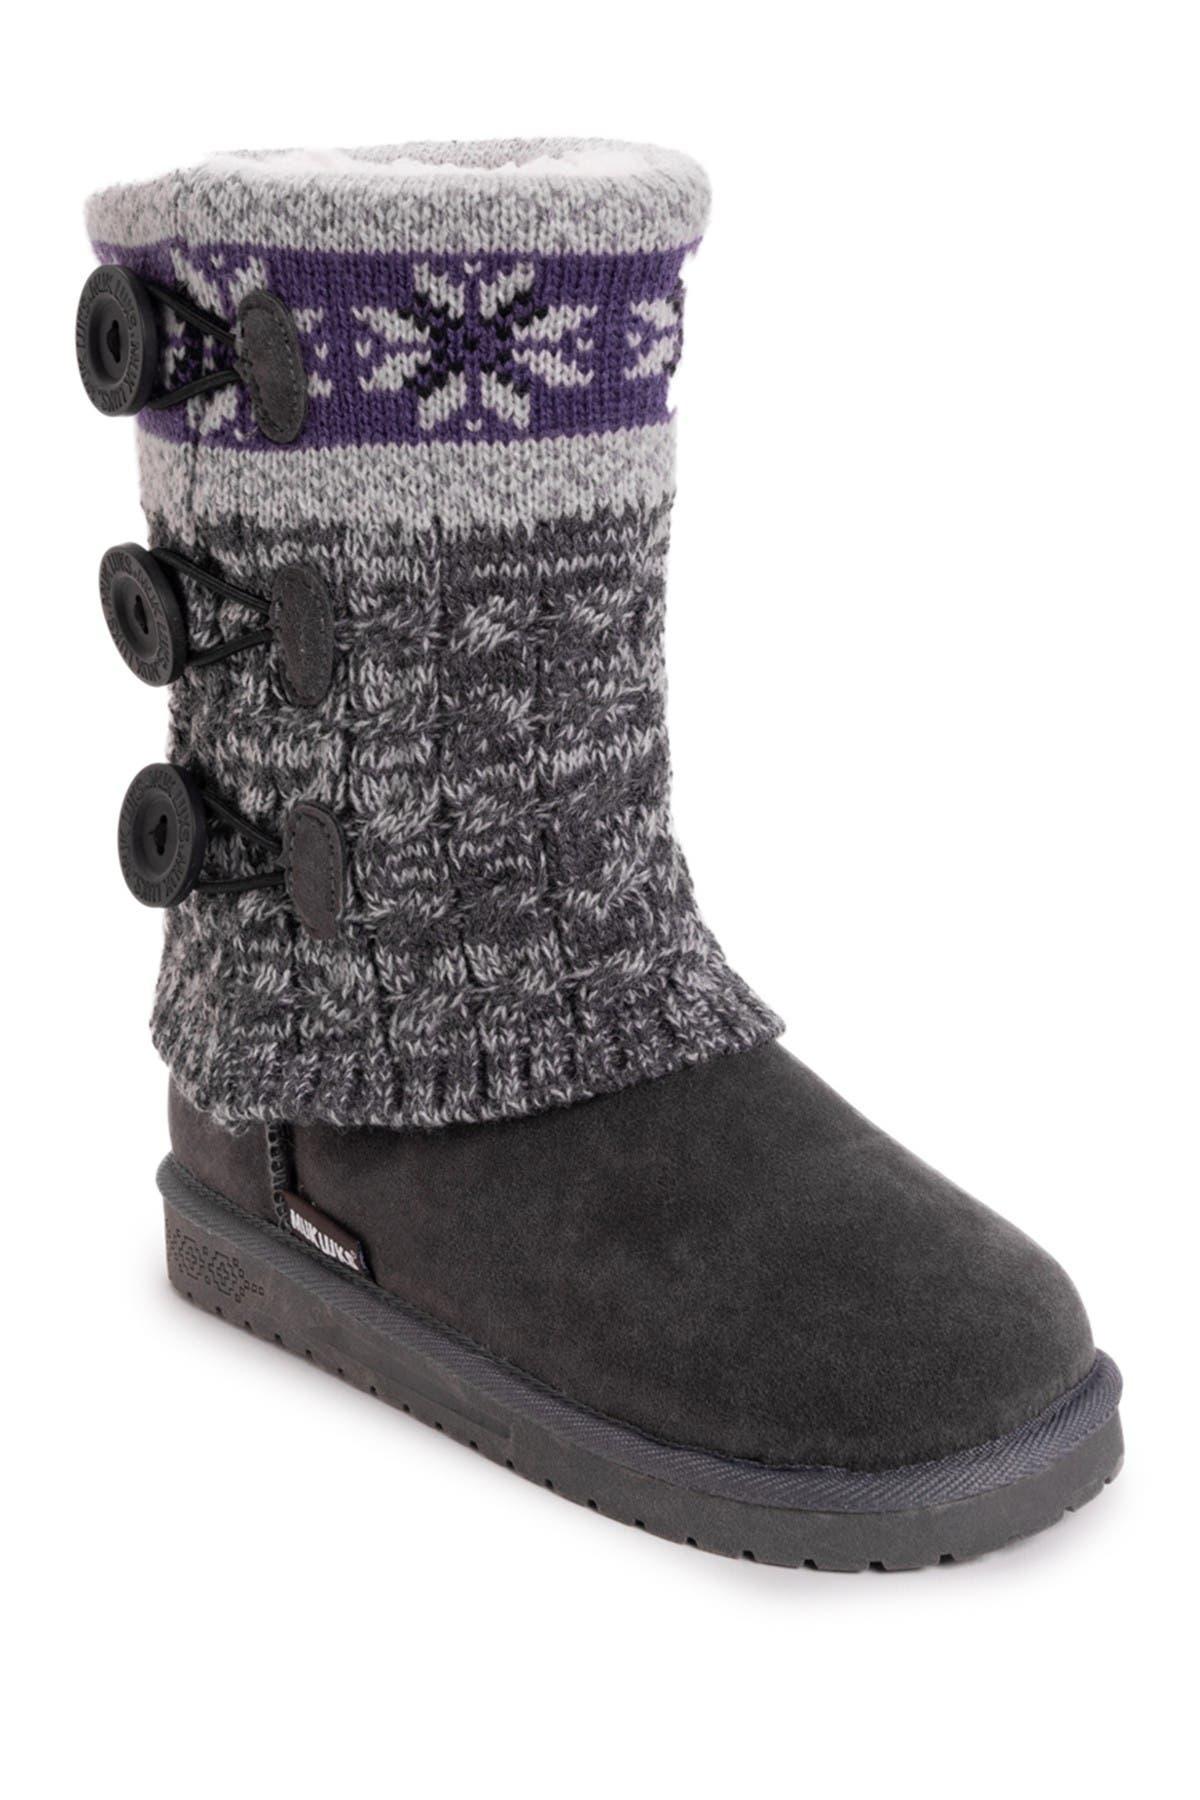 MUK LUKS | Cheryl Faux Fur Knit Boot